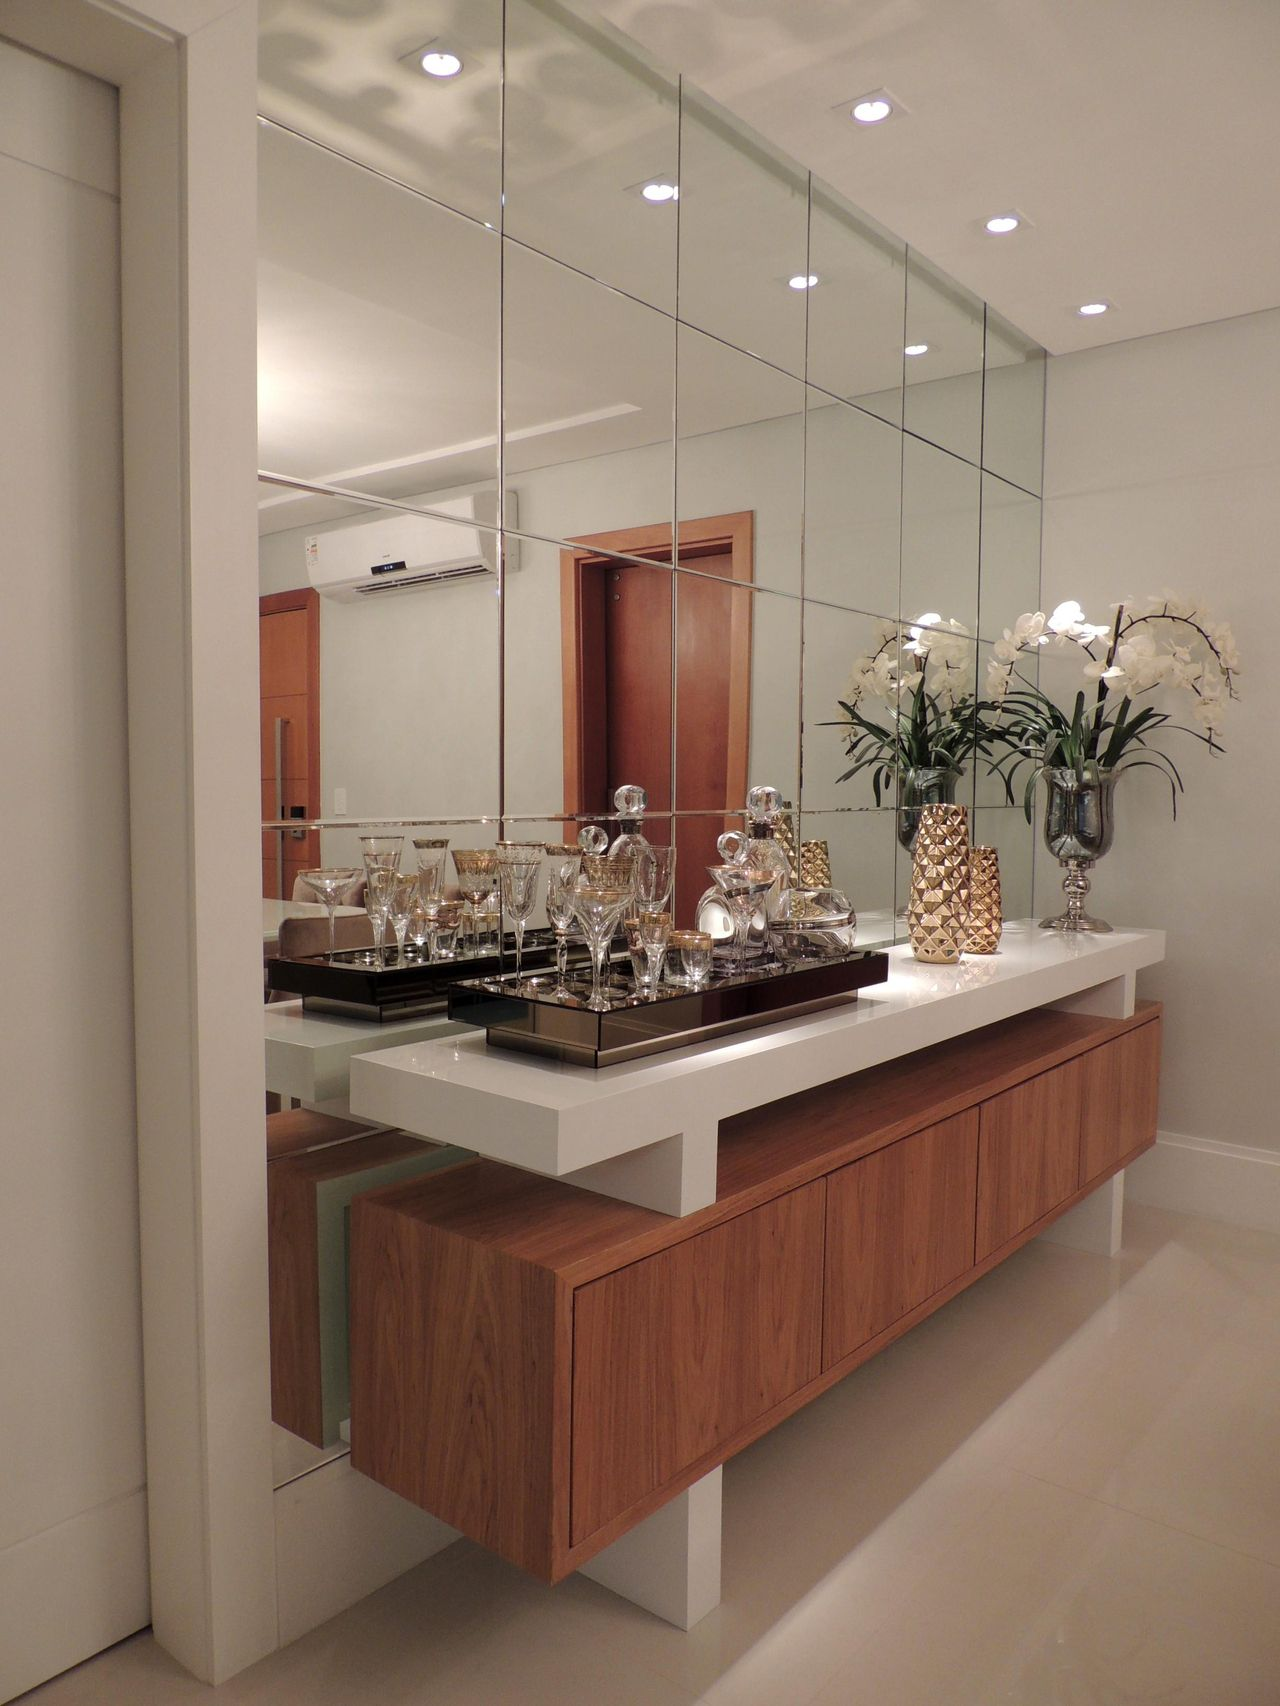 Aparador Sala Cool Decorao De Ambientes With Aparador Sala Fabulous Mil Ambientes With  # Decoração Para Aparador De Sala De Estar